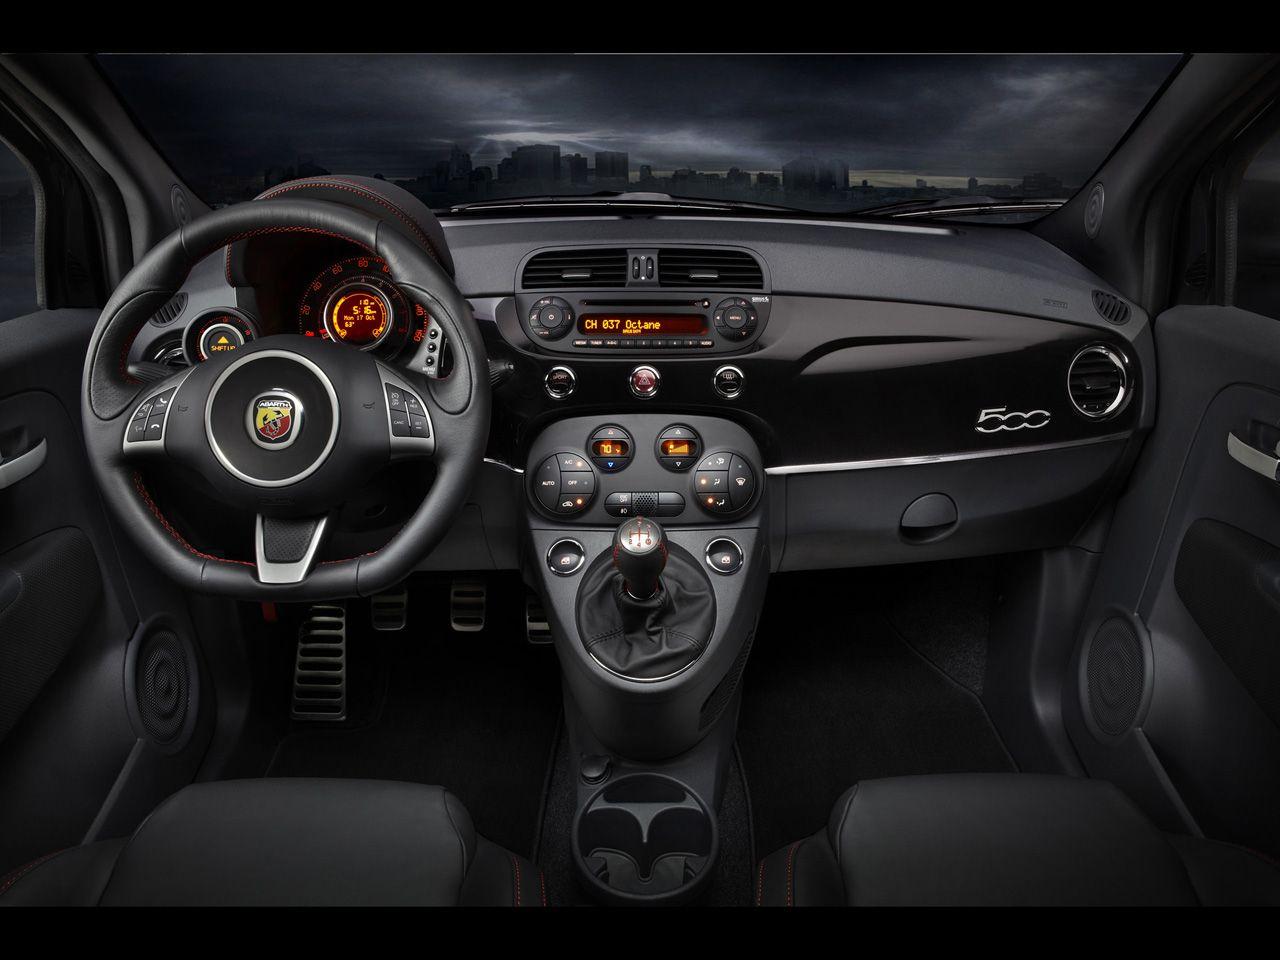 2013 Fiat 500 Abarth And 500c Abarth Dashboard 1280x960